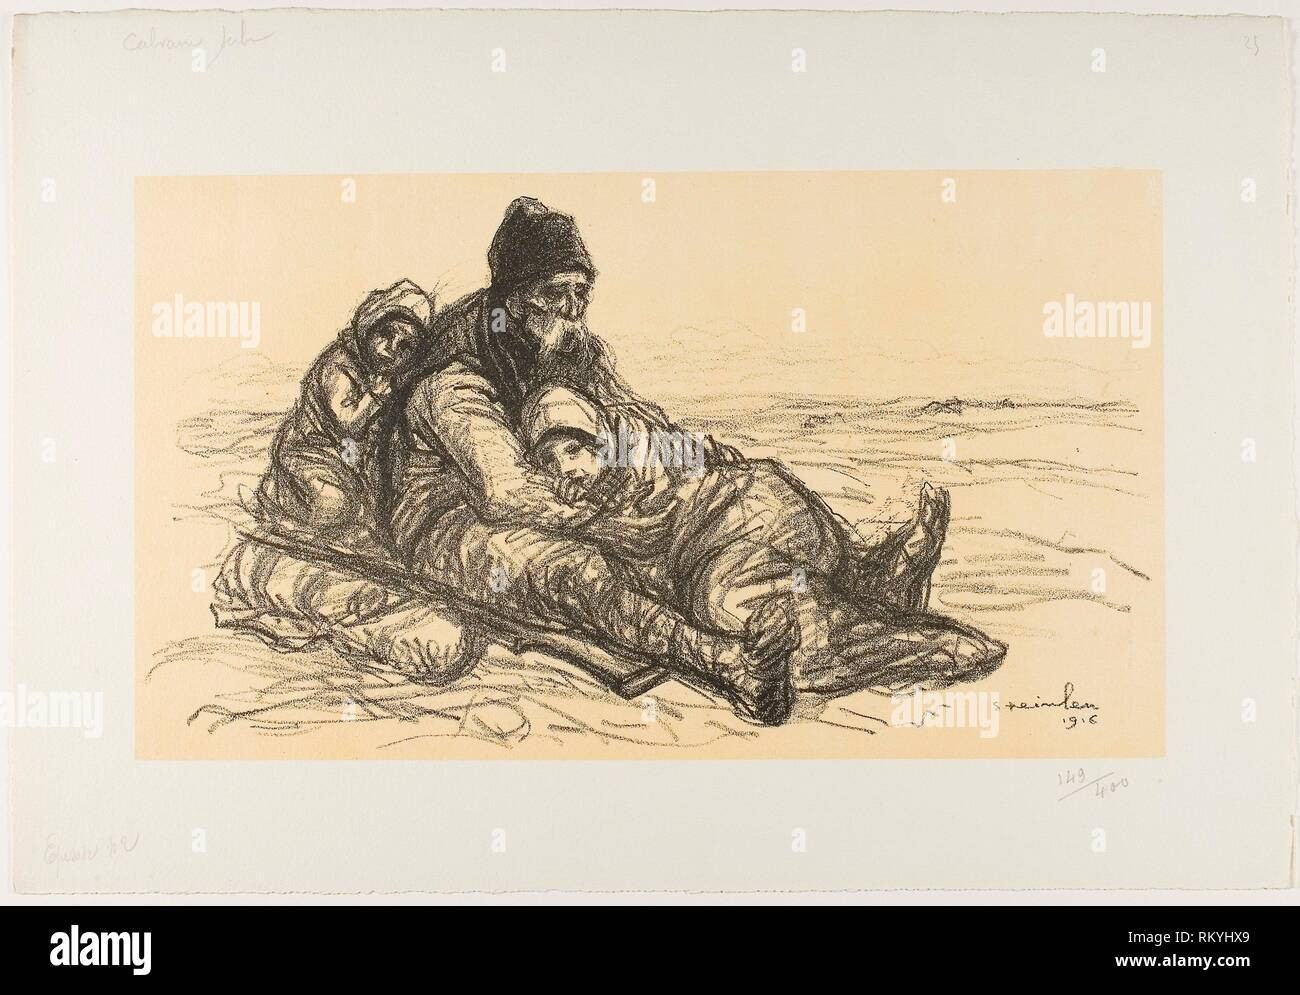 Serbian Cavalry, Second Episode - 1916 - Théophile-Alexandre Steinlen French, born Switzerland, 1859-1923 - Artist: Théophile-Alexandre Pierre - Stock Image